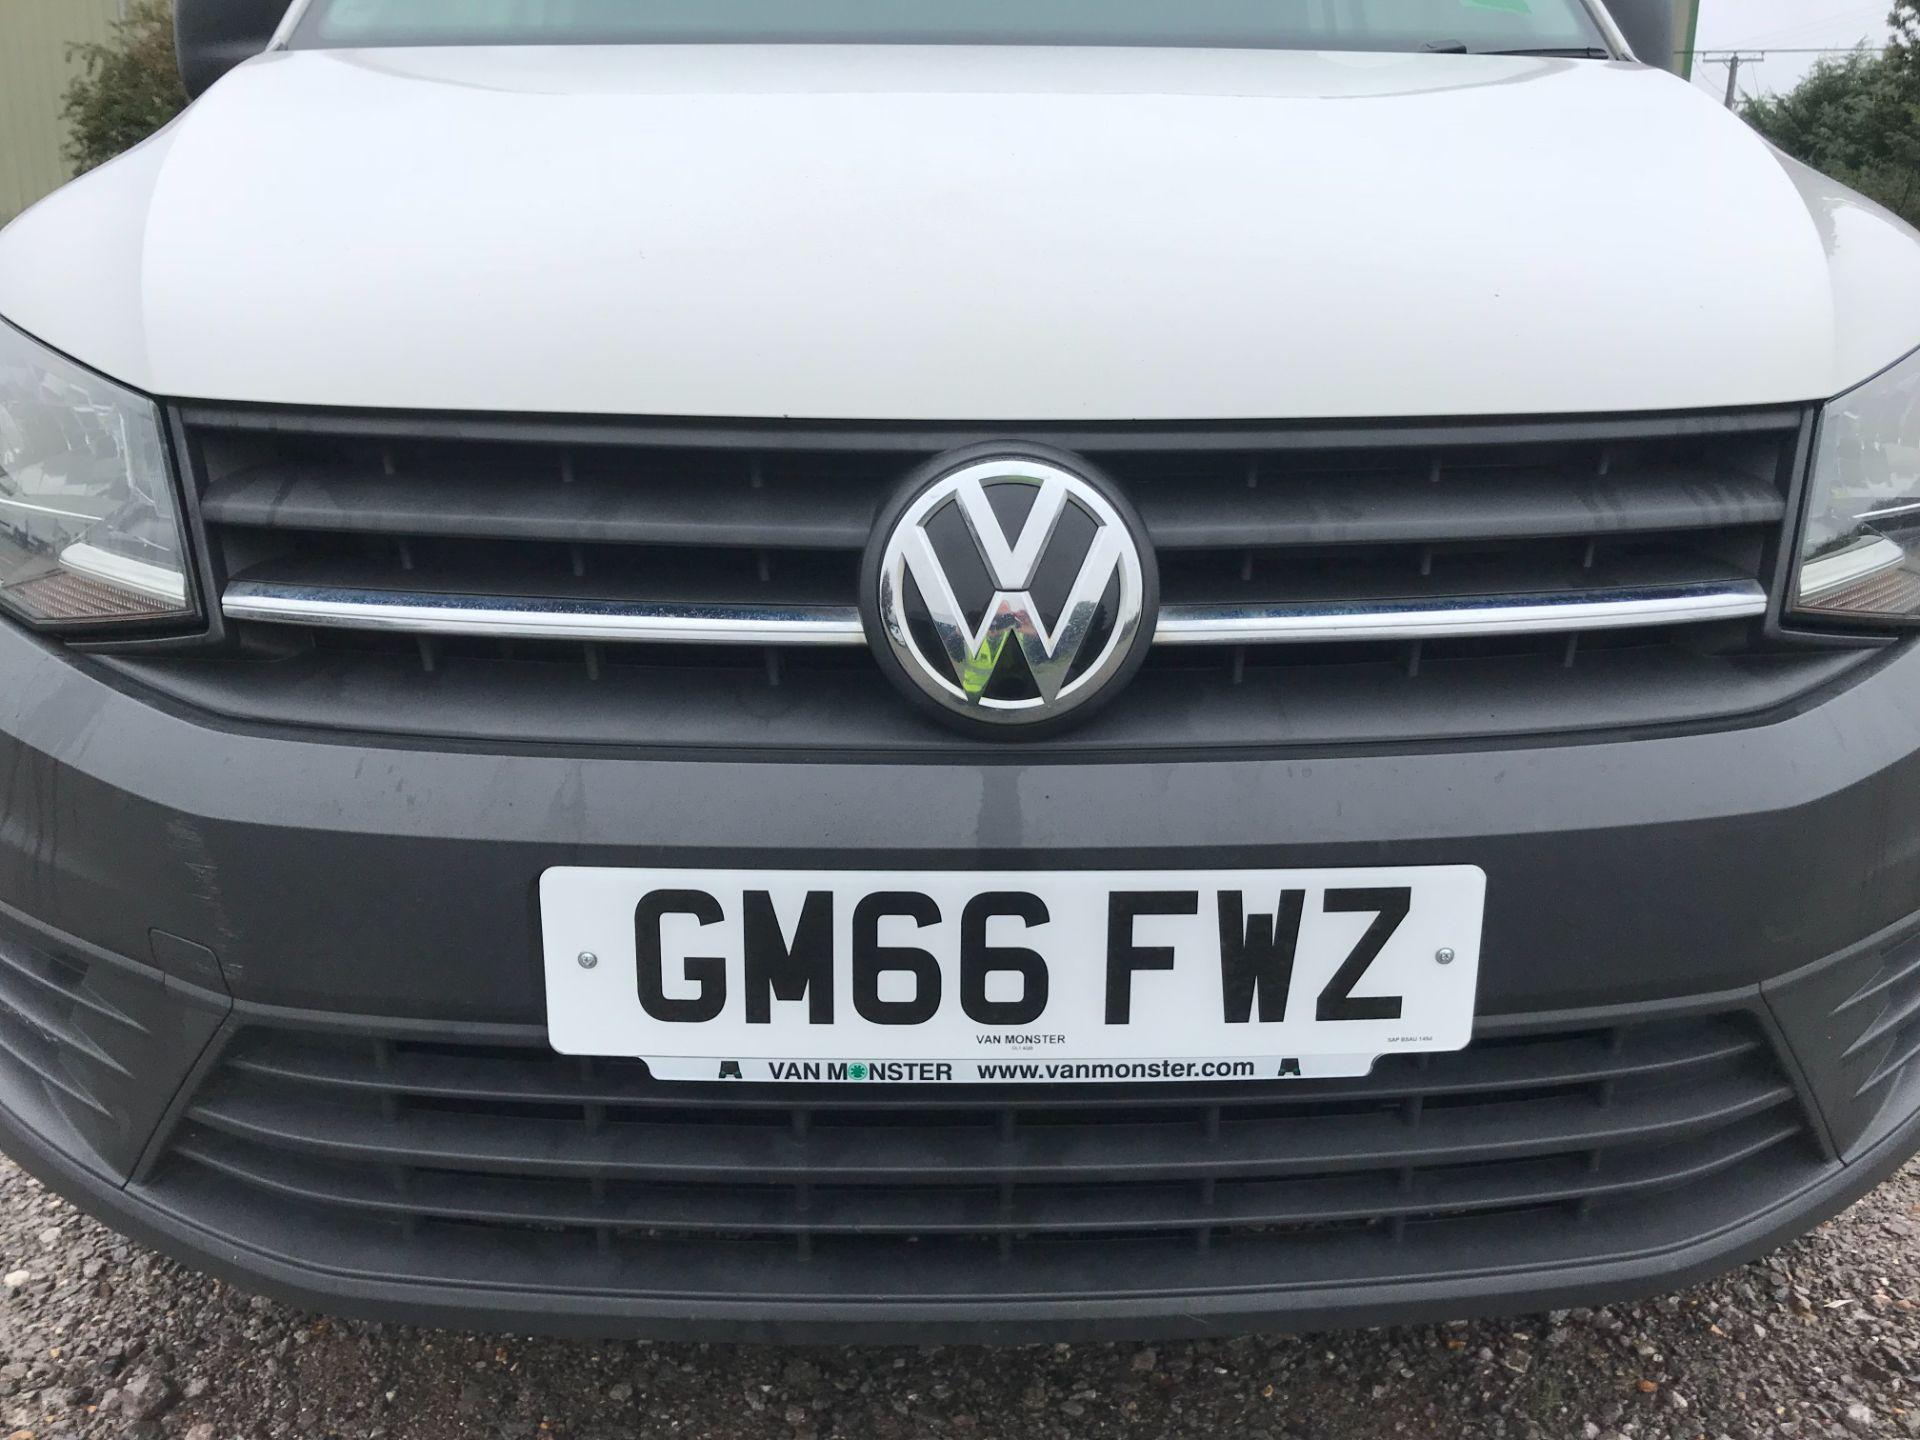 2017 Volkswagen Caddy 2.0 Tdi Bluemotion Tech 102Ps Startline Van (GM66FWZ) Image 30